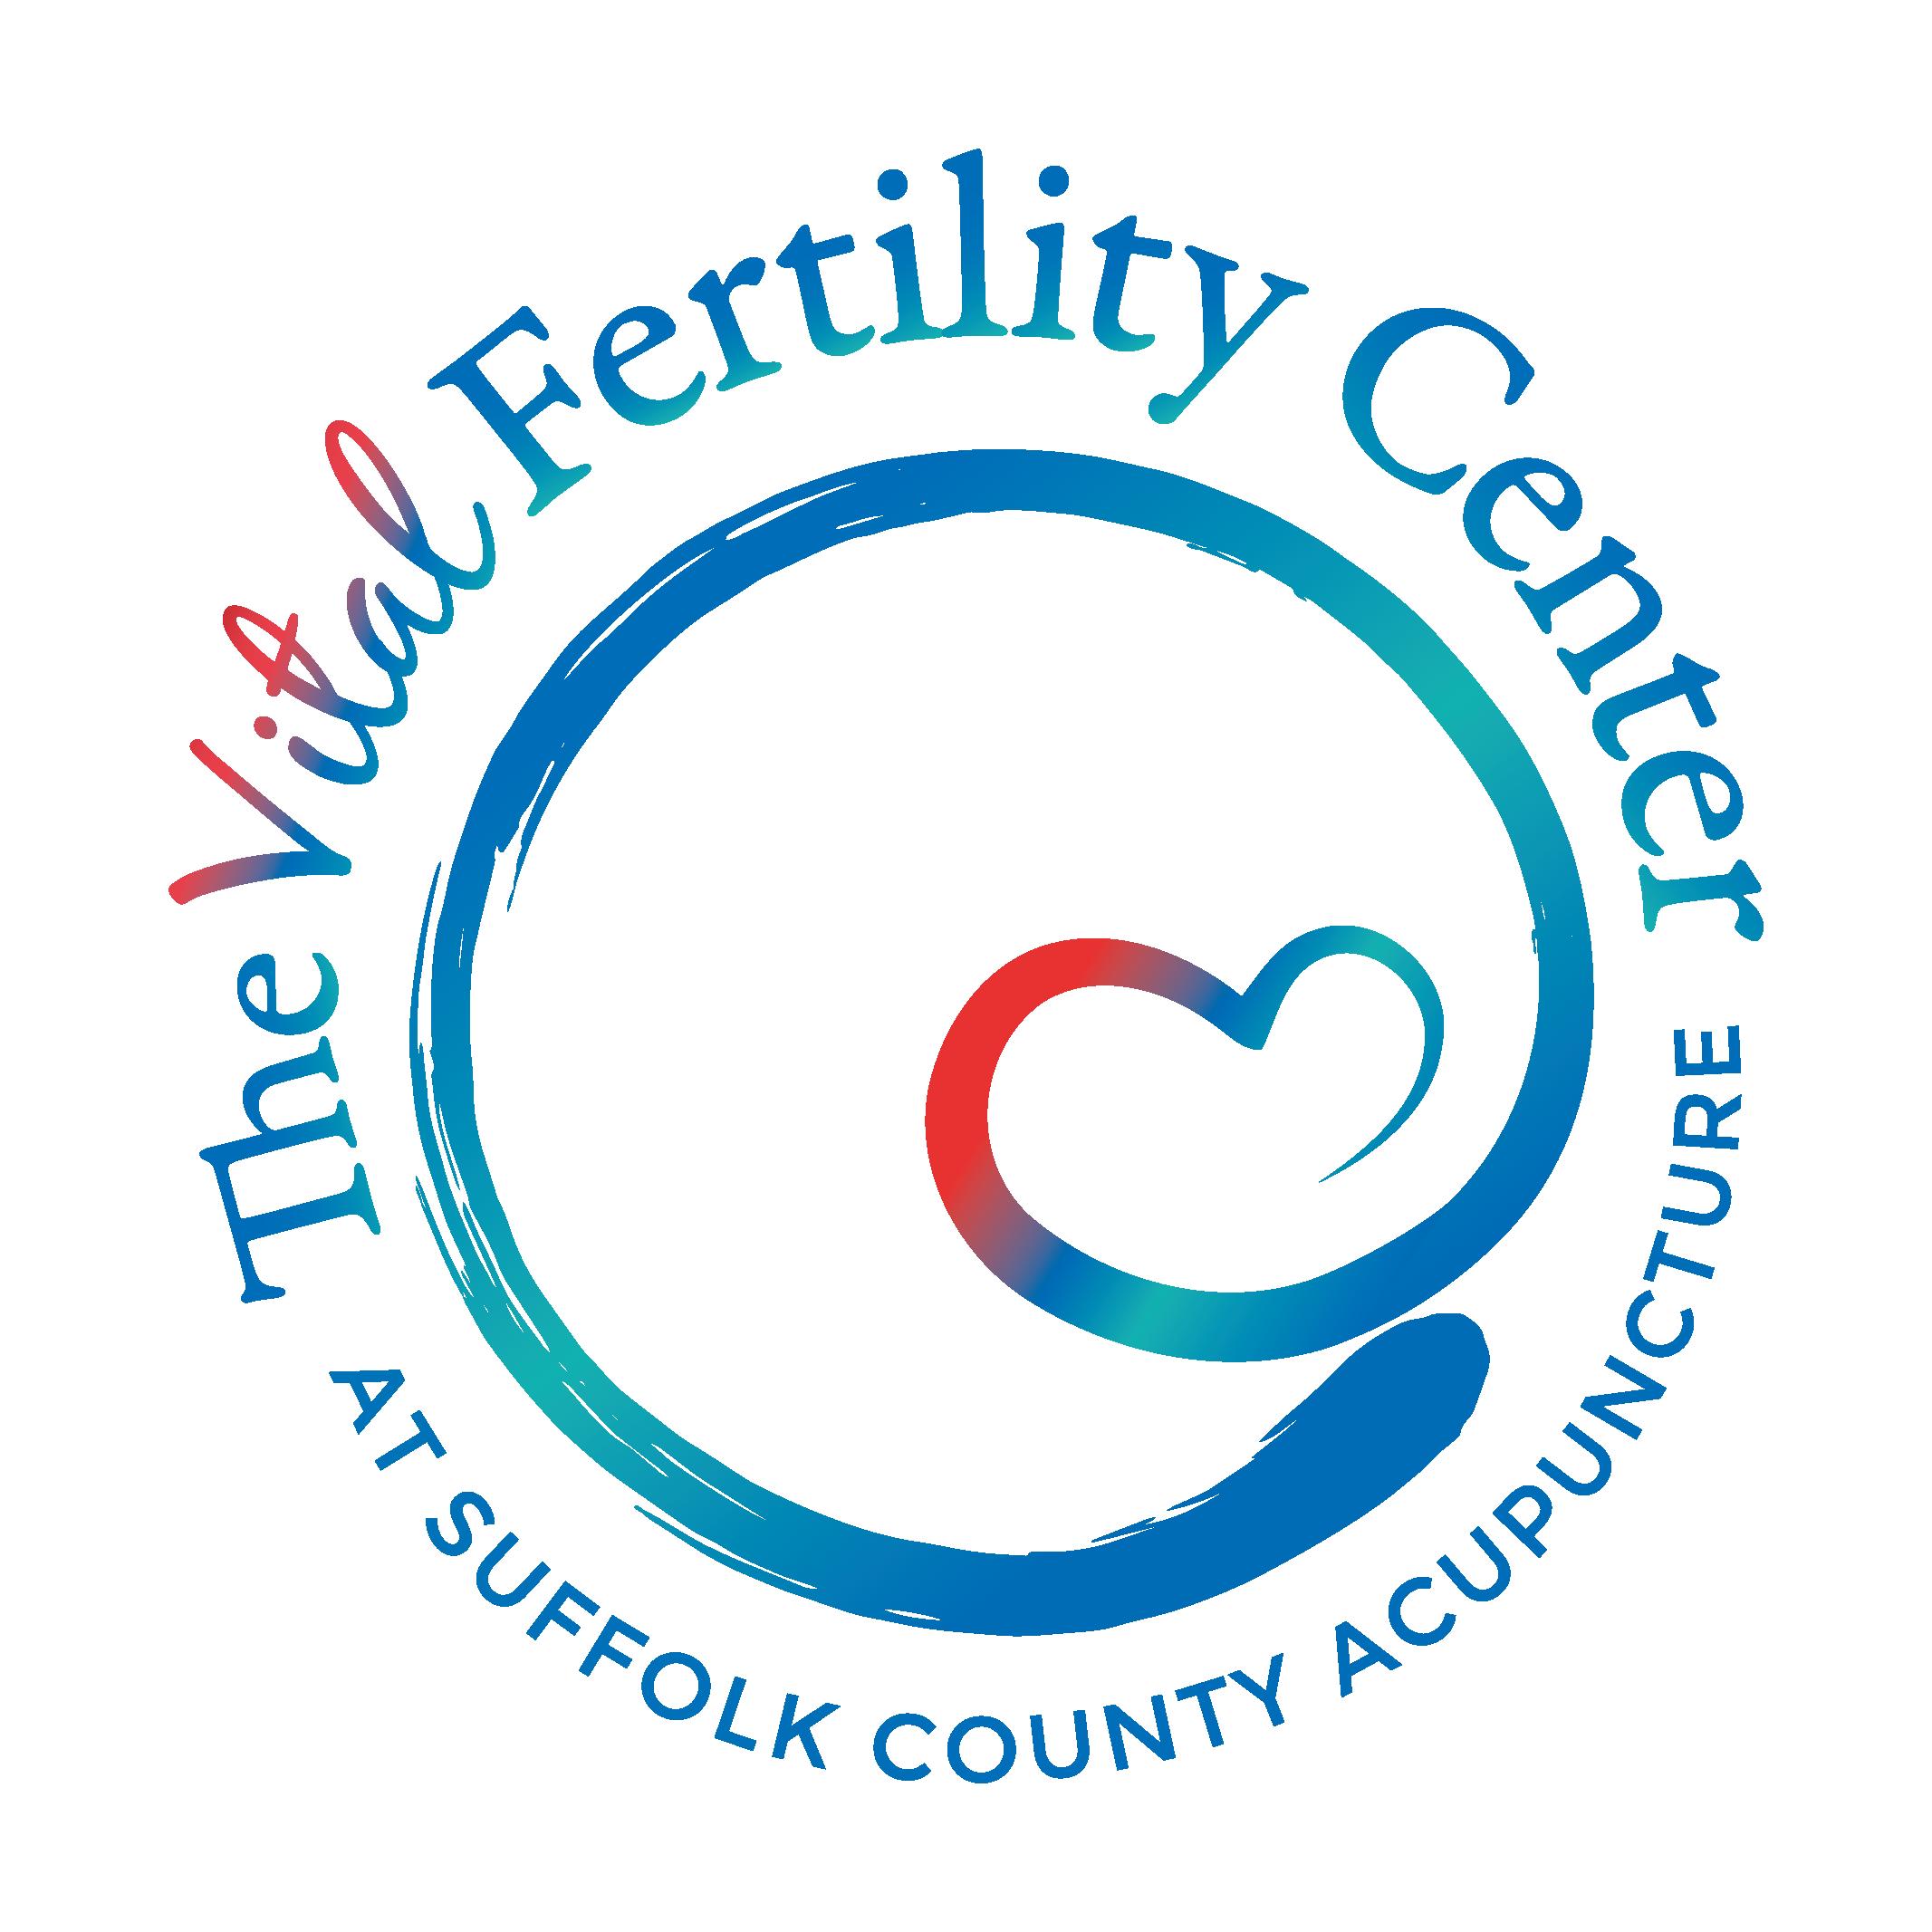 Pin by The Vital Fertility Center on Fertility